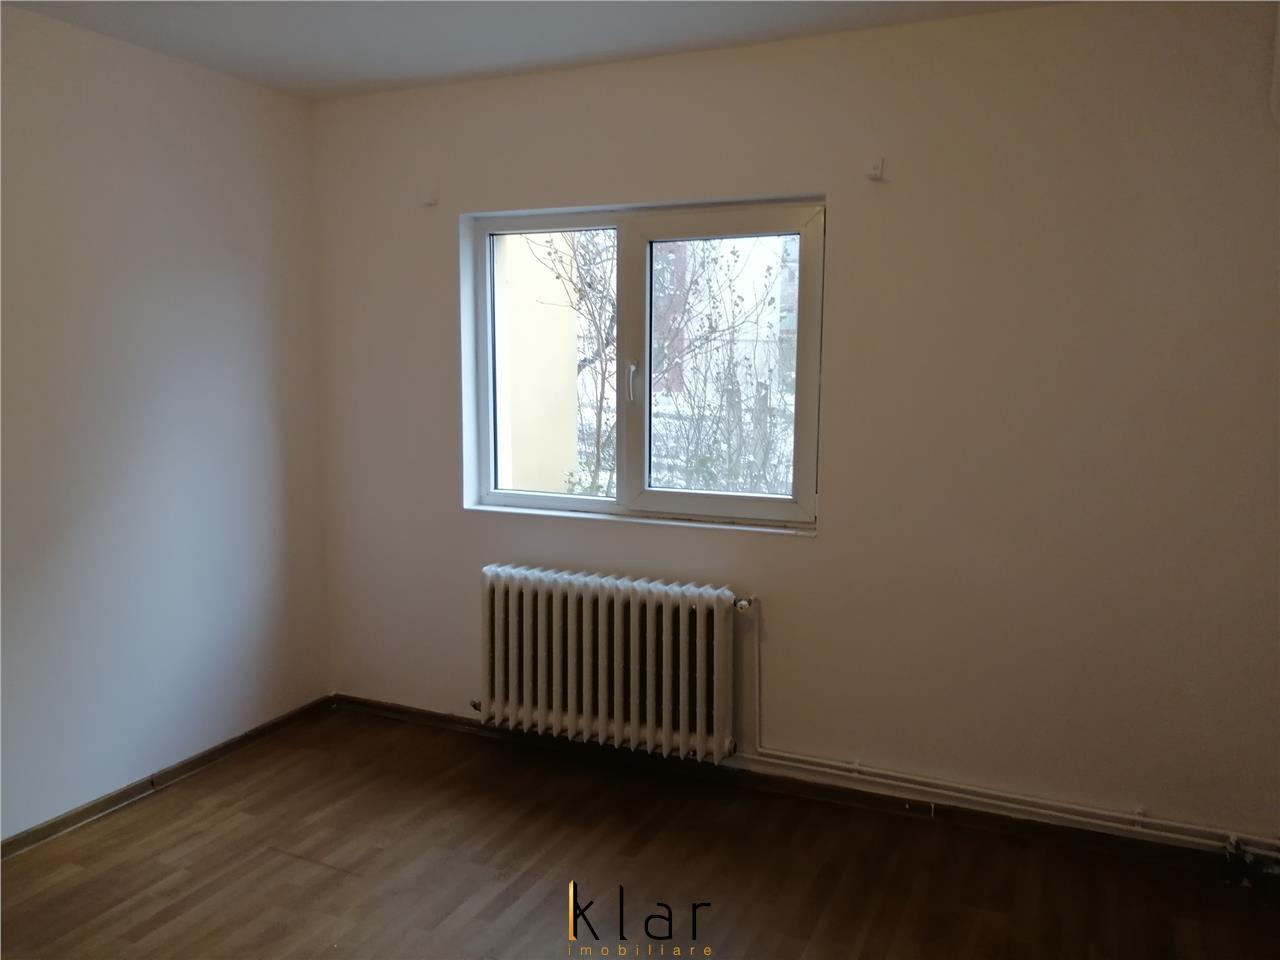 Apartament 3 camere pentru investitie, Marasti!